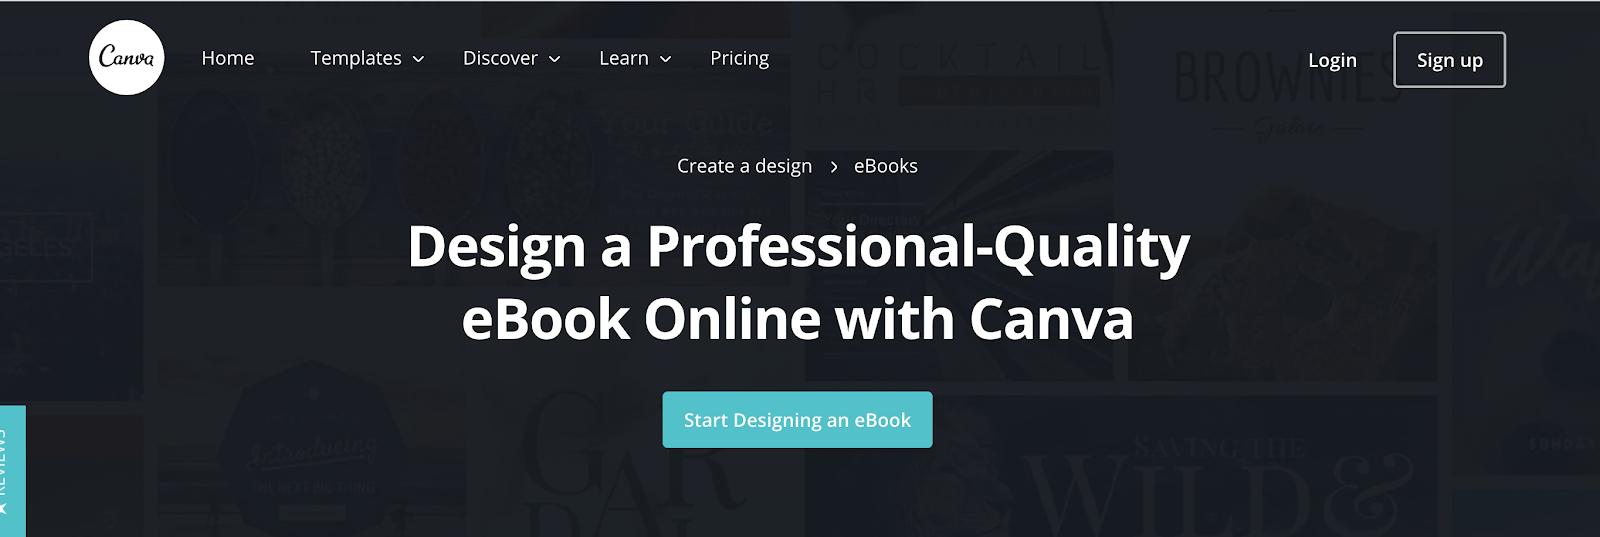 Canva Homepage Screenshot (eBook Designer Tool)